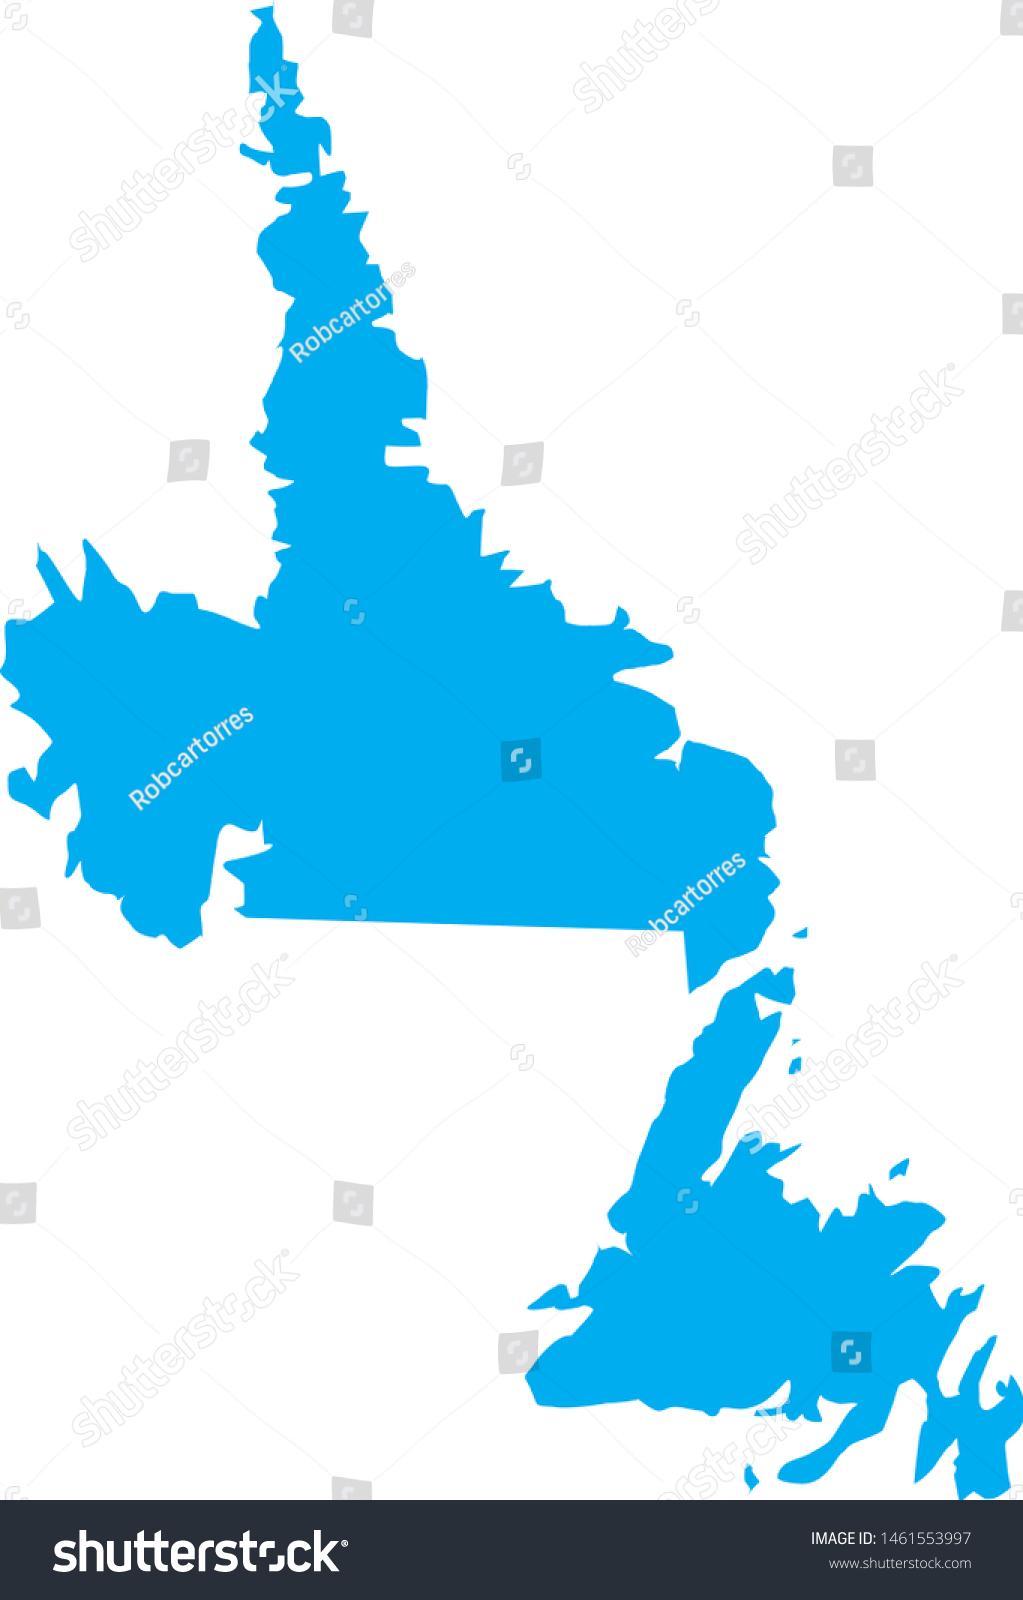 Newfoundland Labrador State Map Canada Stock Vector Royalty Free 1461553997